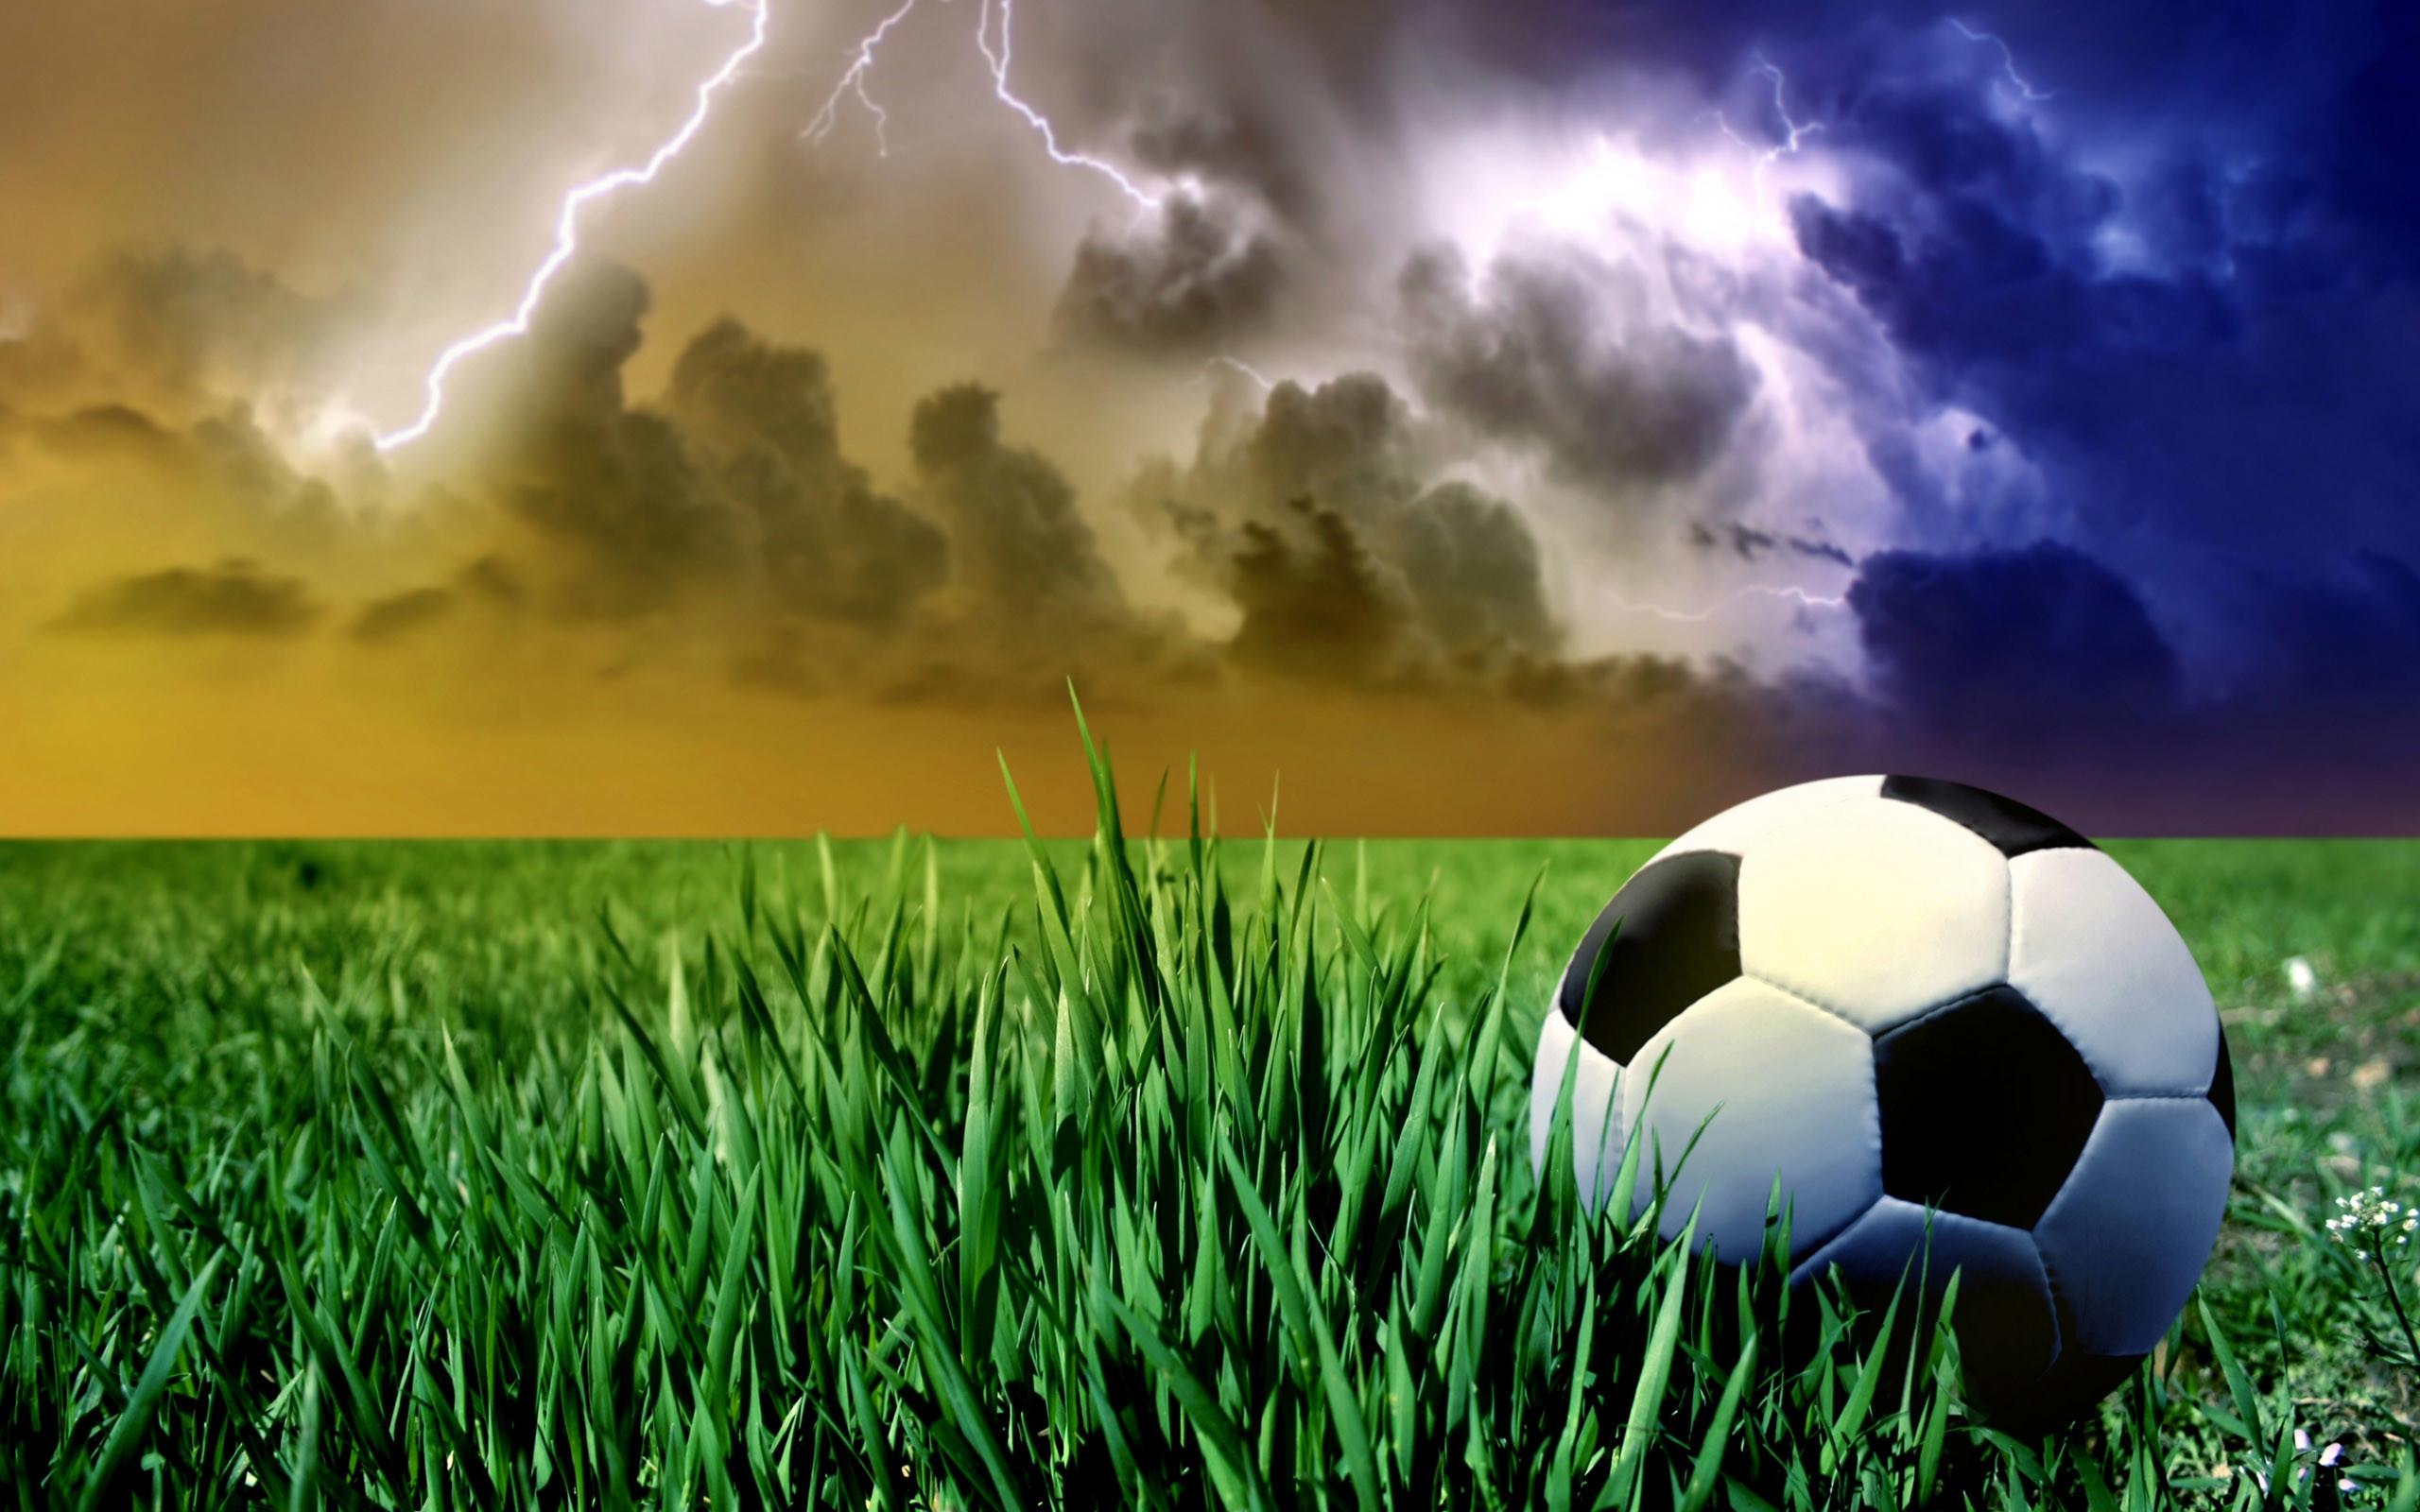 Download Cool Soccer Wallpaper Free.